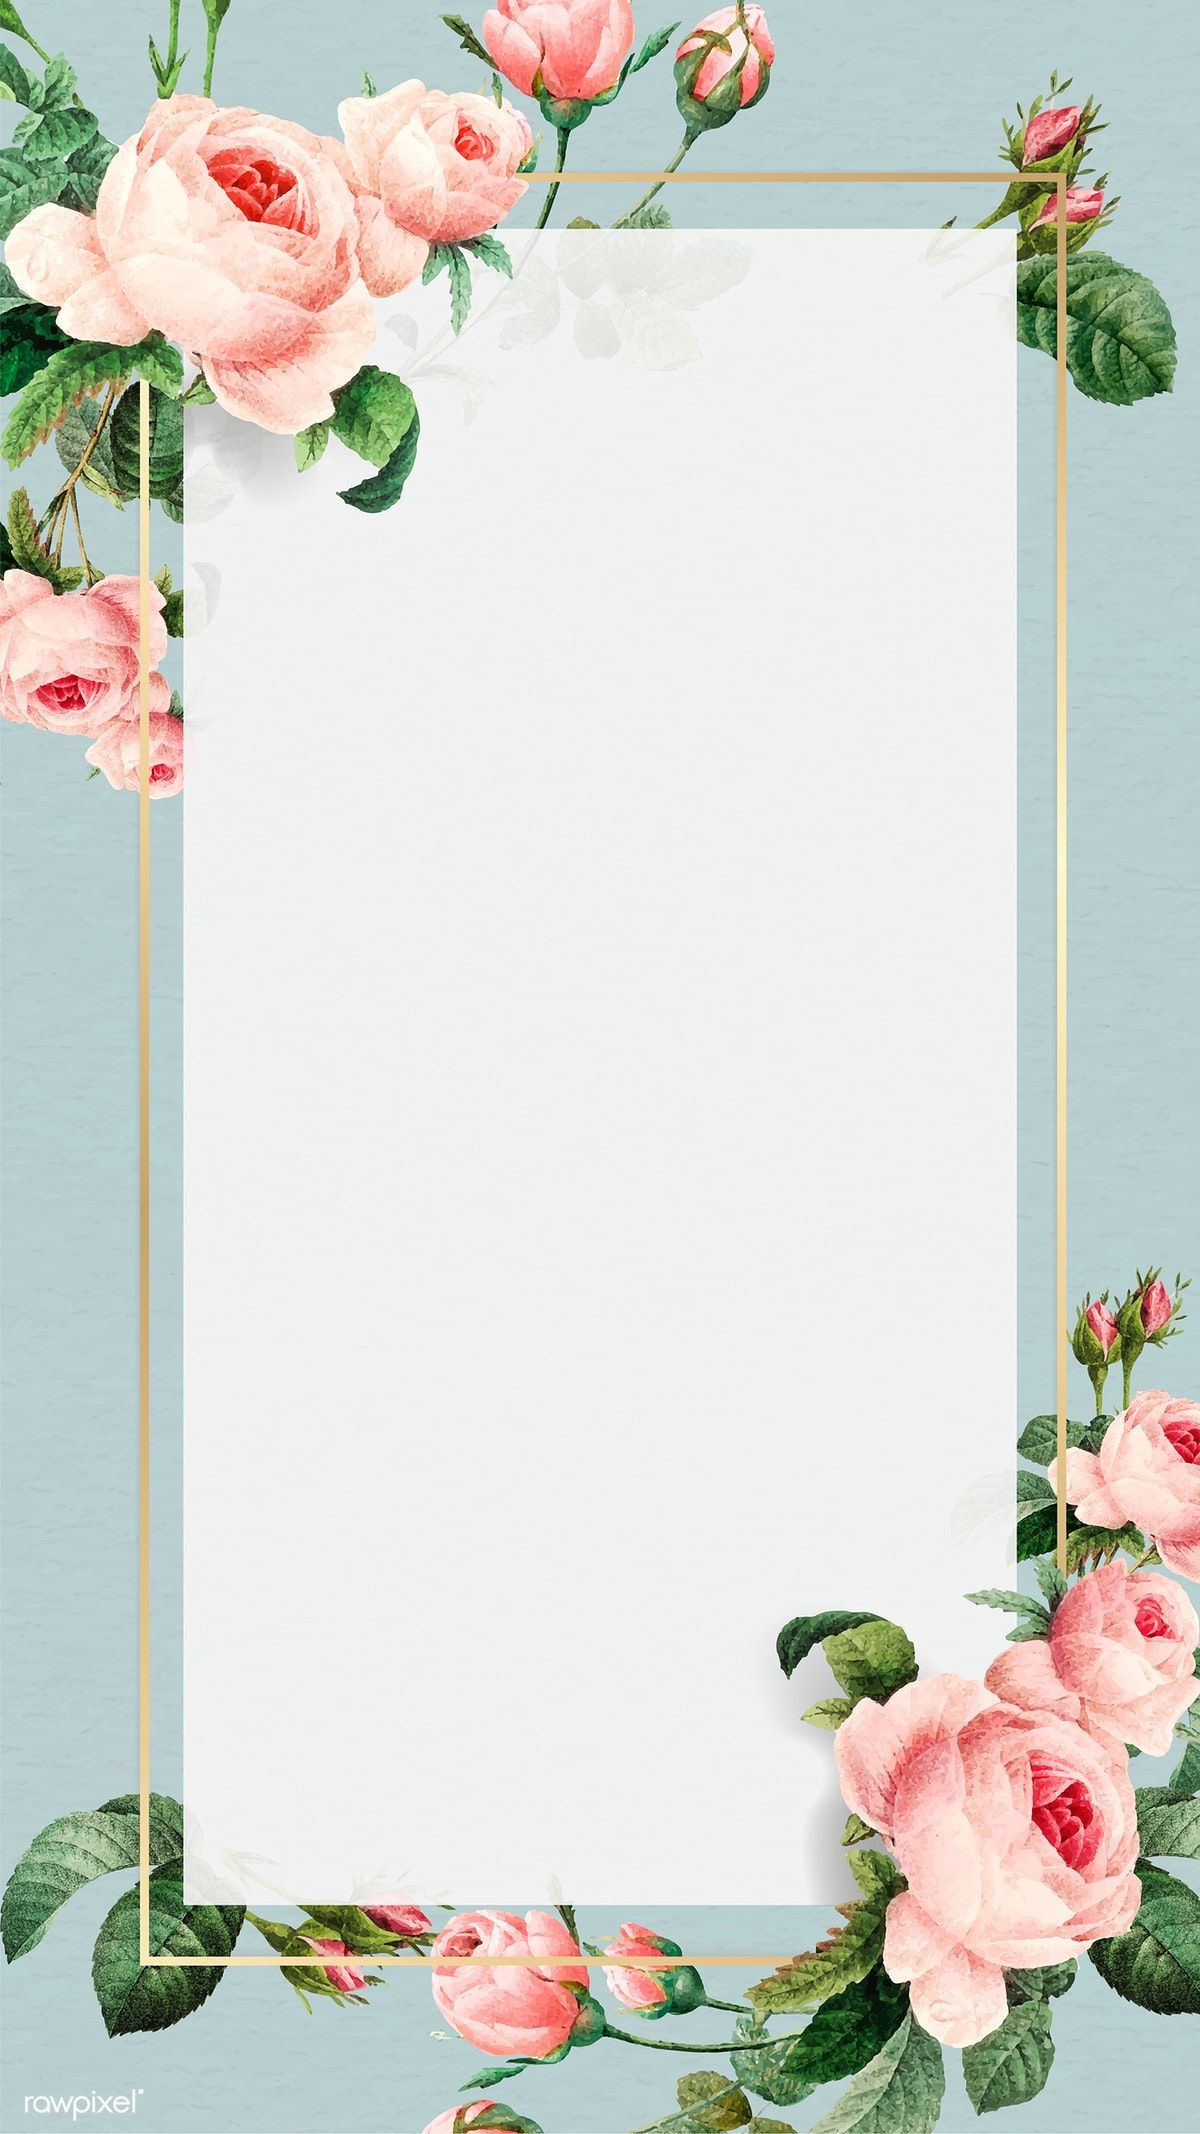 Download Premium Vector Of Golden Rectangle Frame Vector Mobile Phone Flower Background Wallpaper Framed Wallpaper Boarders And Frames